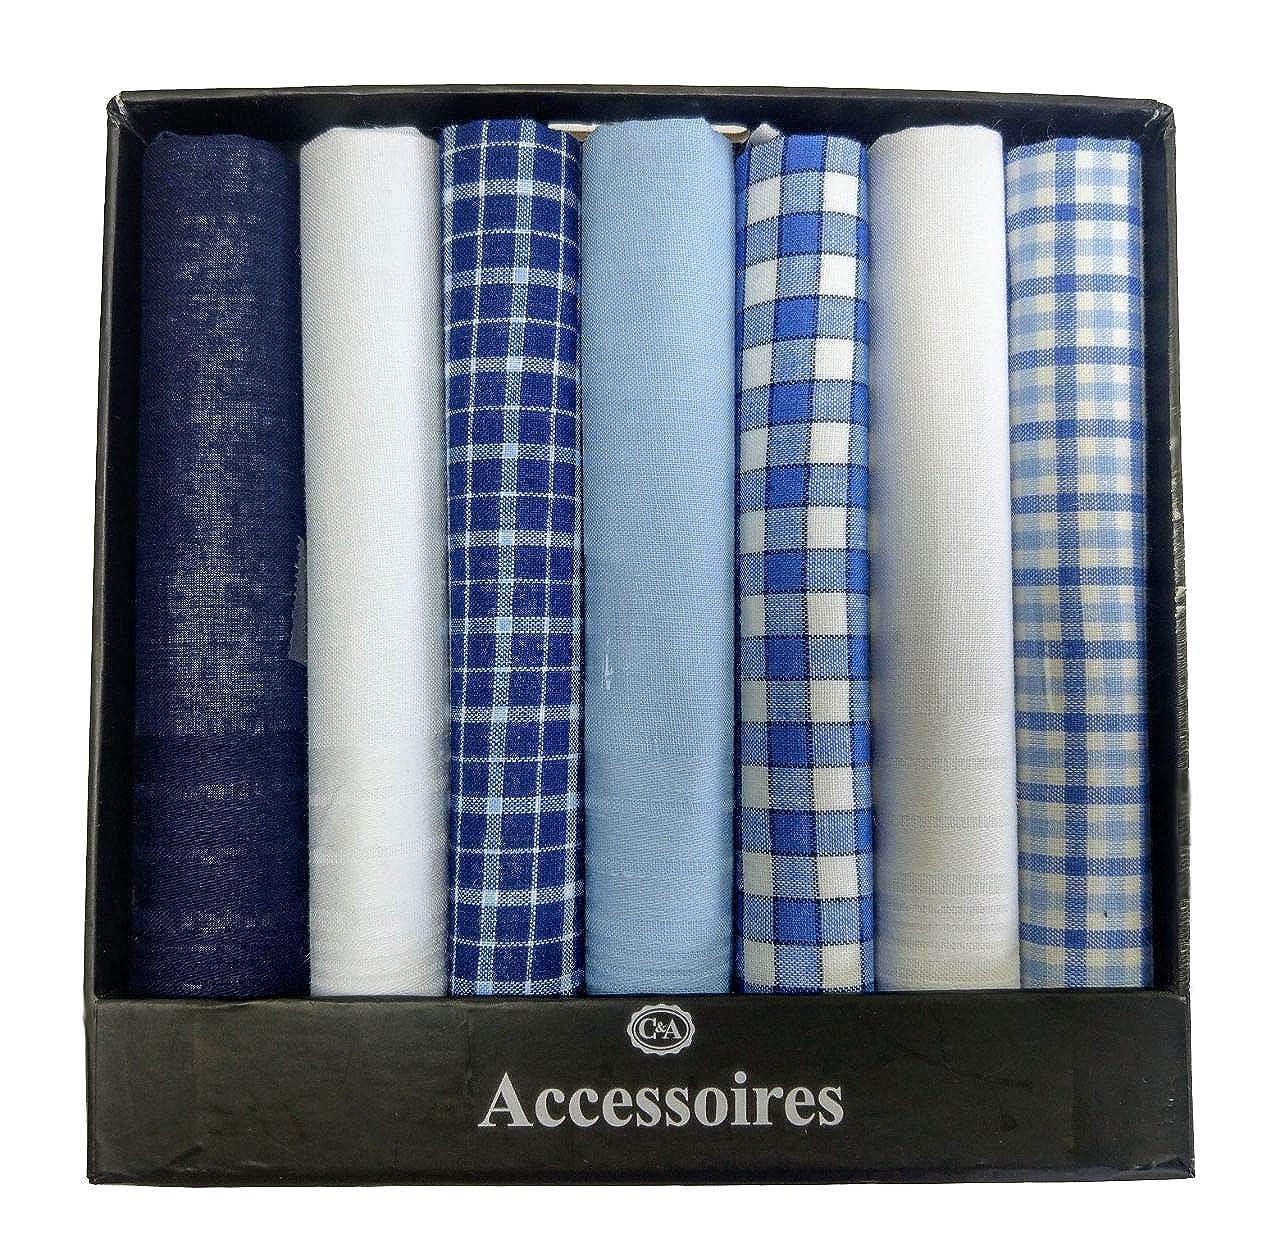 7 Pack Men's Gift 100% Cotton Assorted Blue White Handkerchief Multi pack 40cm x 40cm (~16